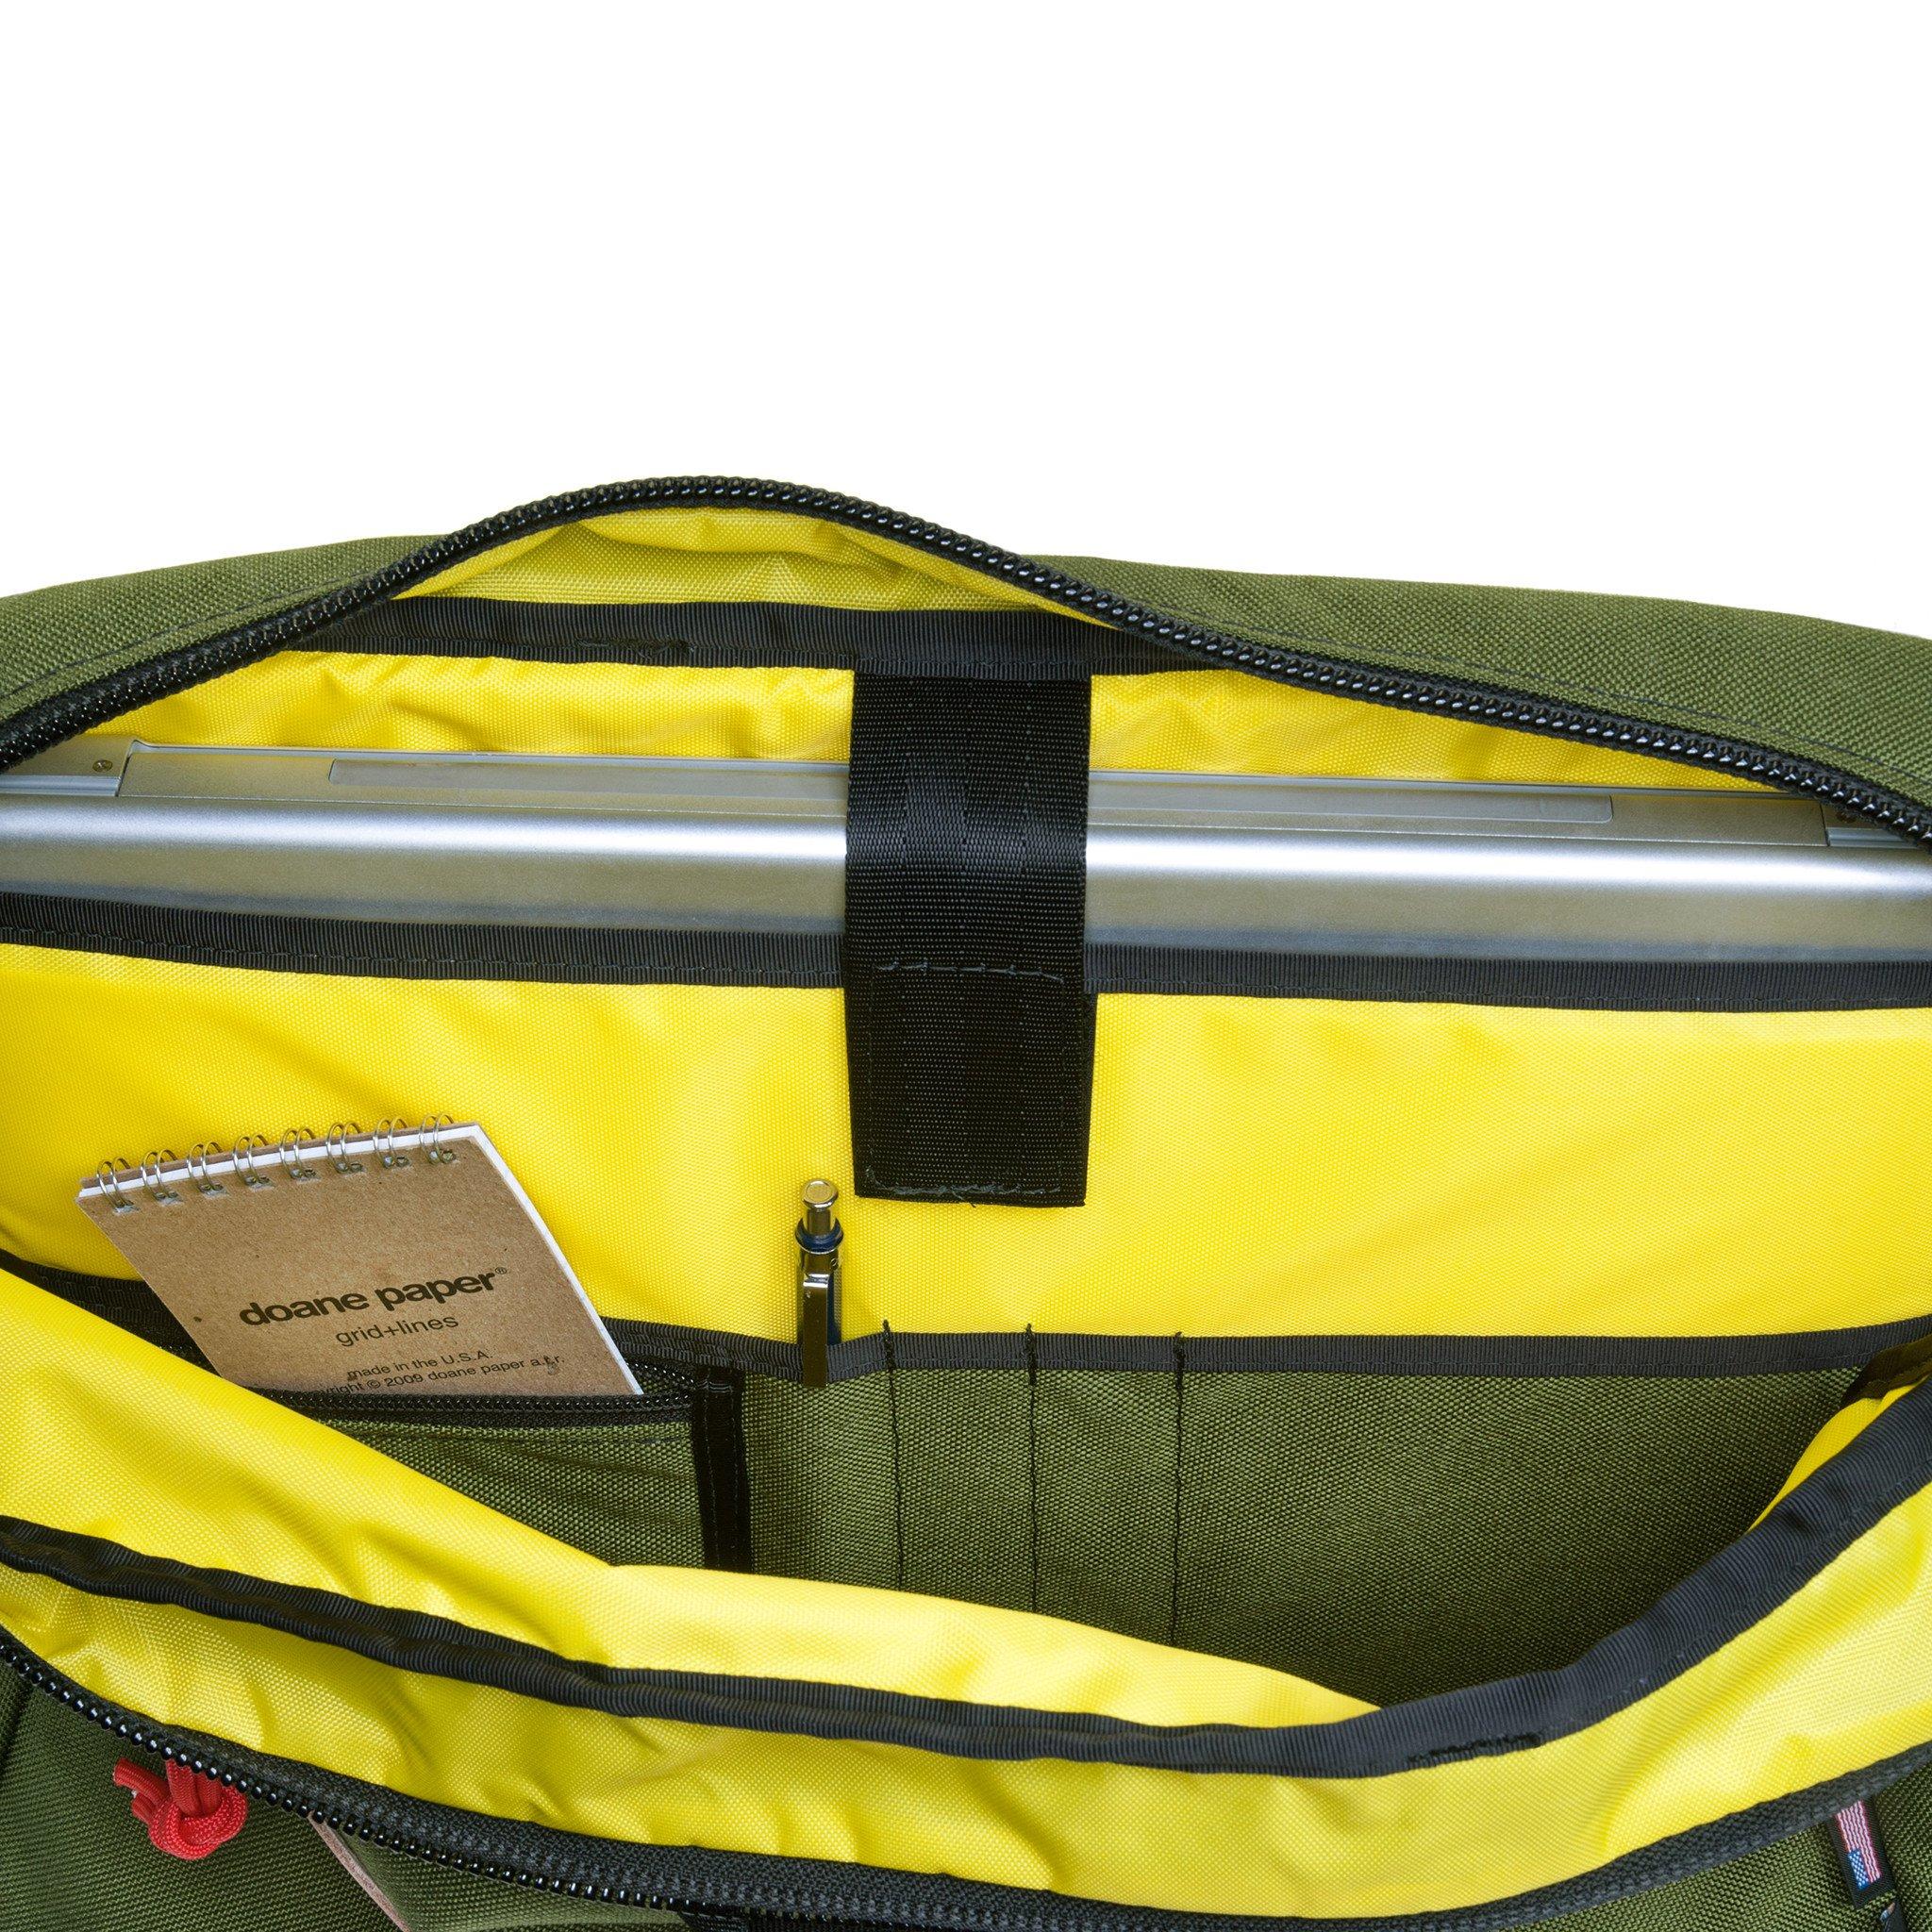 bags-mountain-briefcase-10_2048x2048.jpg